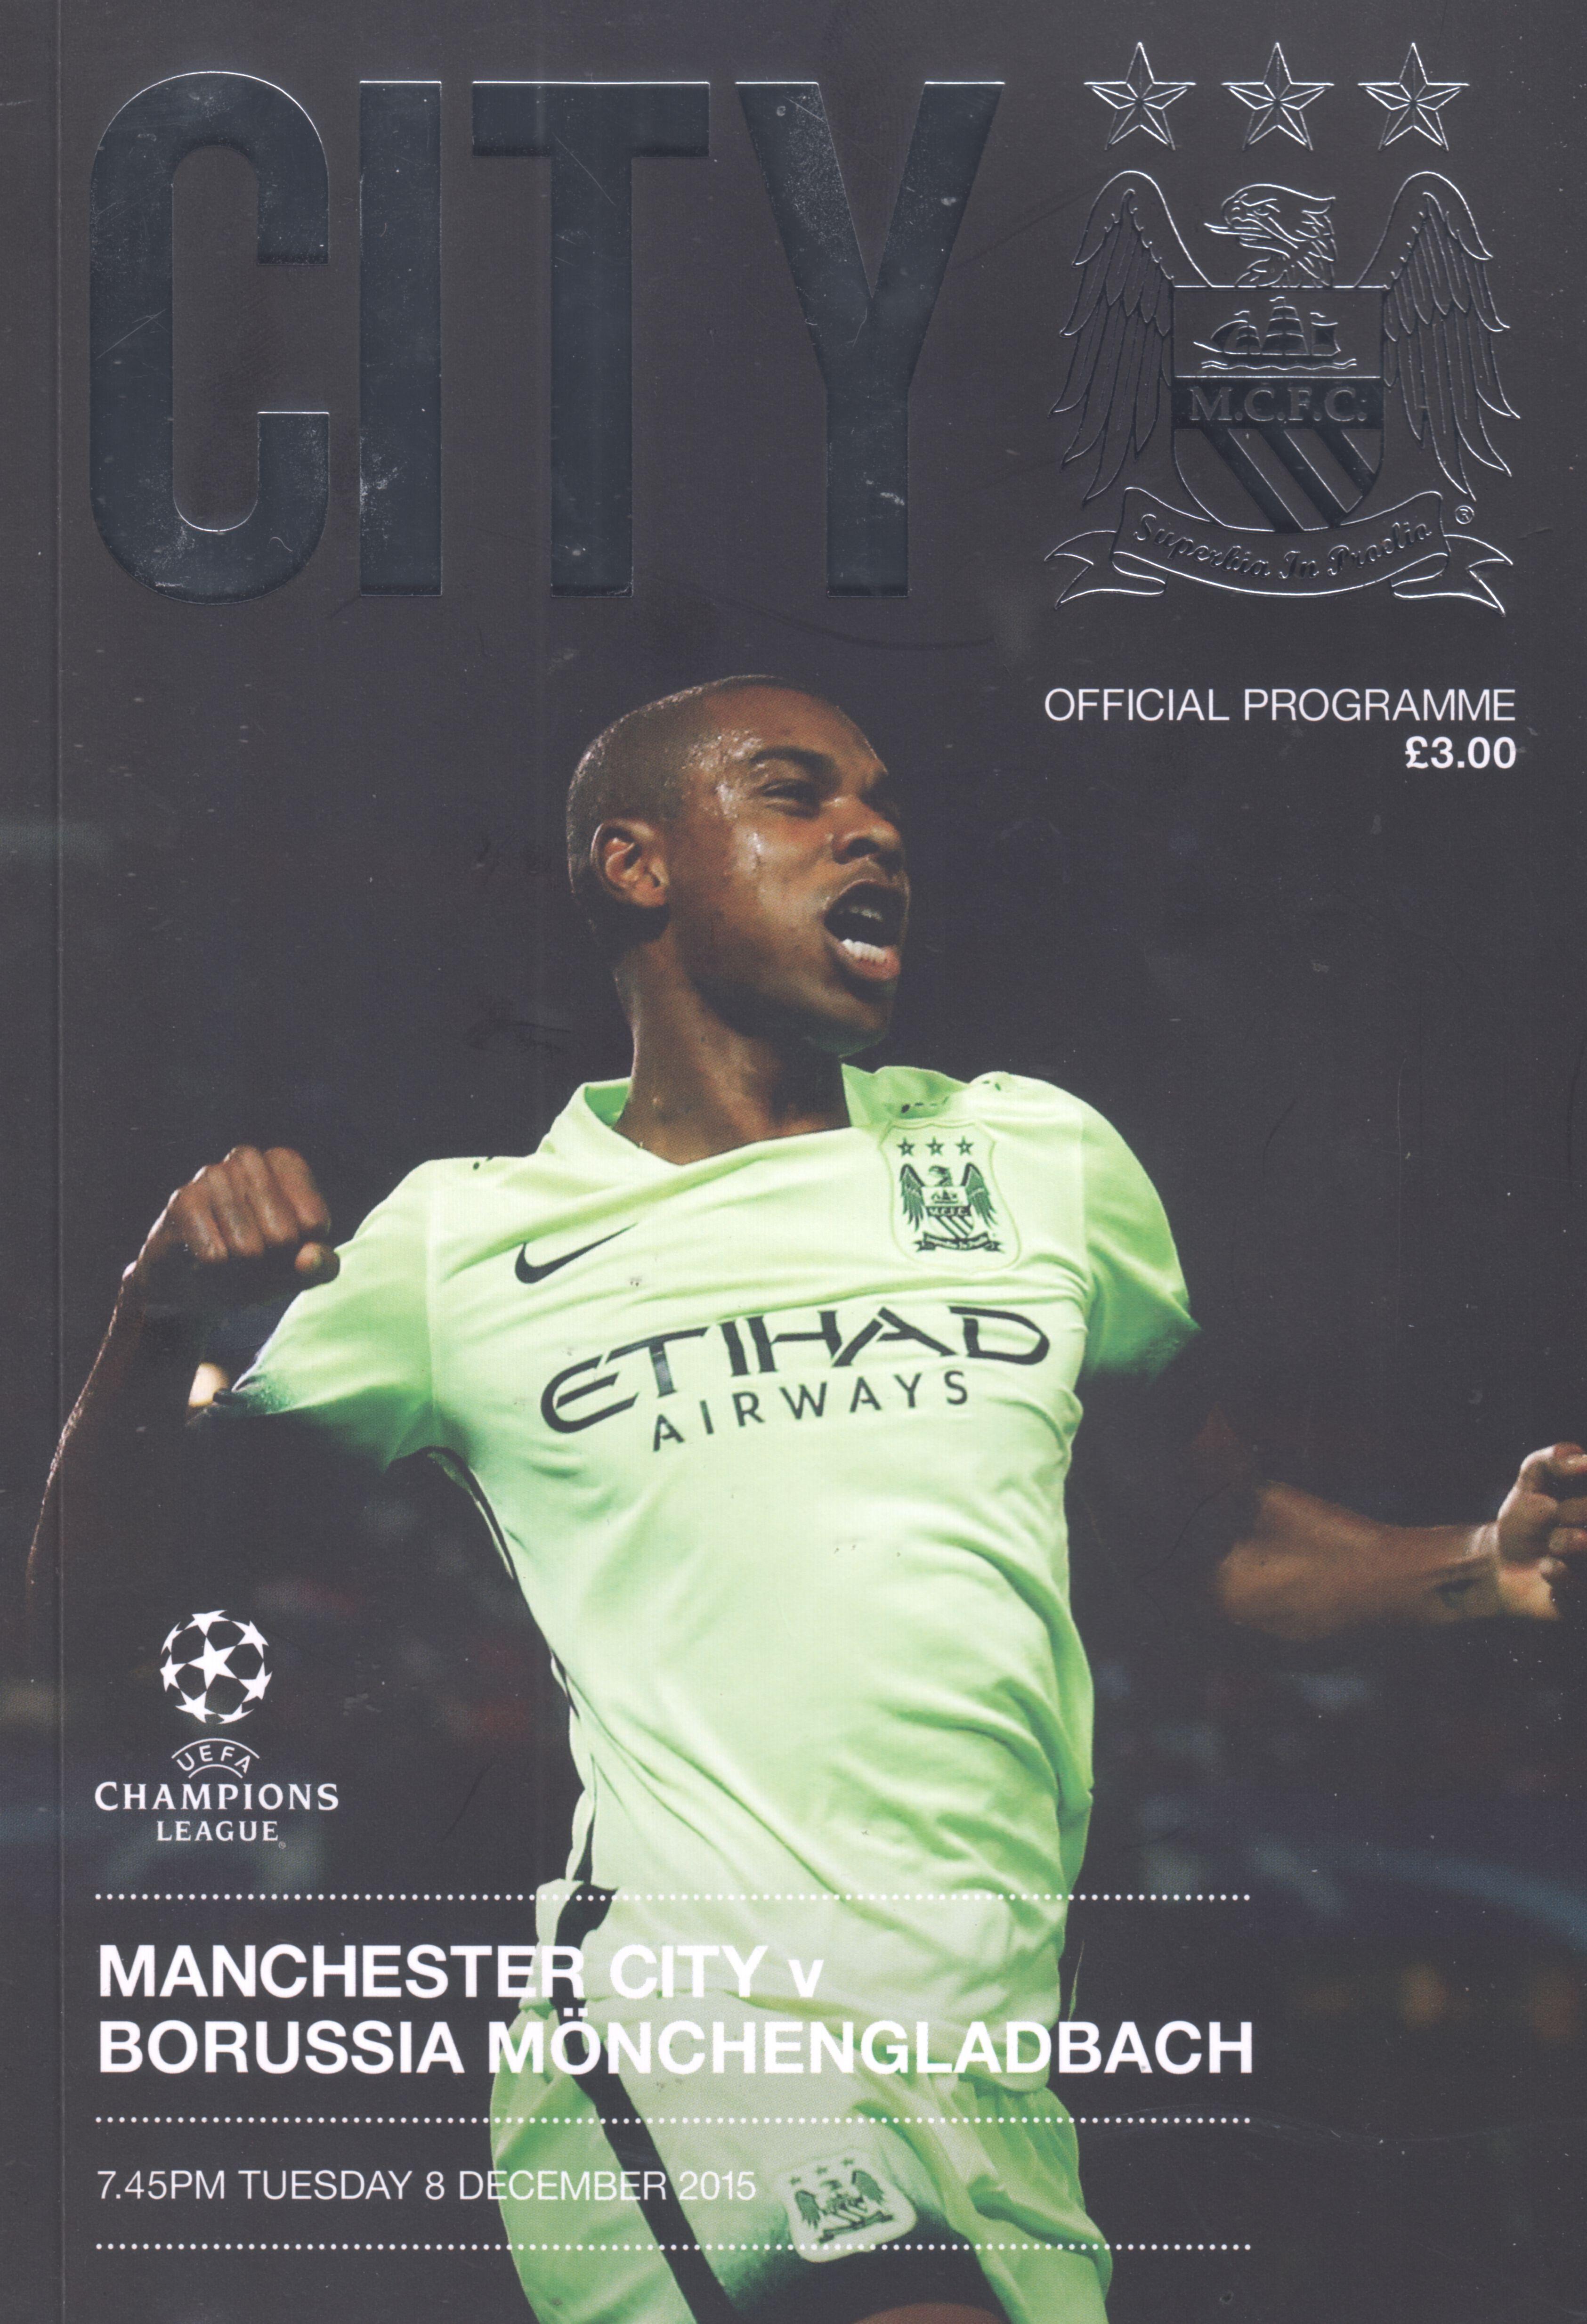 Programm /& Menükarte UEFA CL 2016//17 Mönchengladbach Manchester City